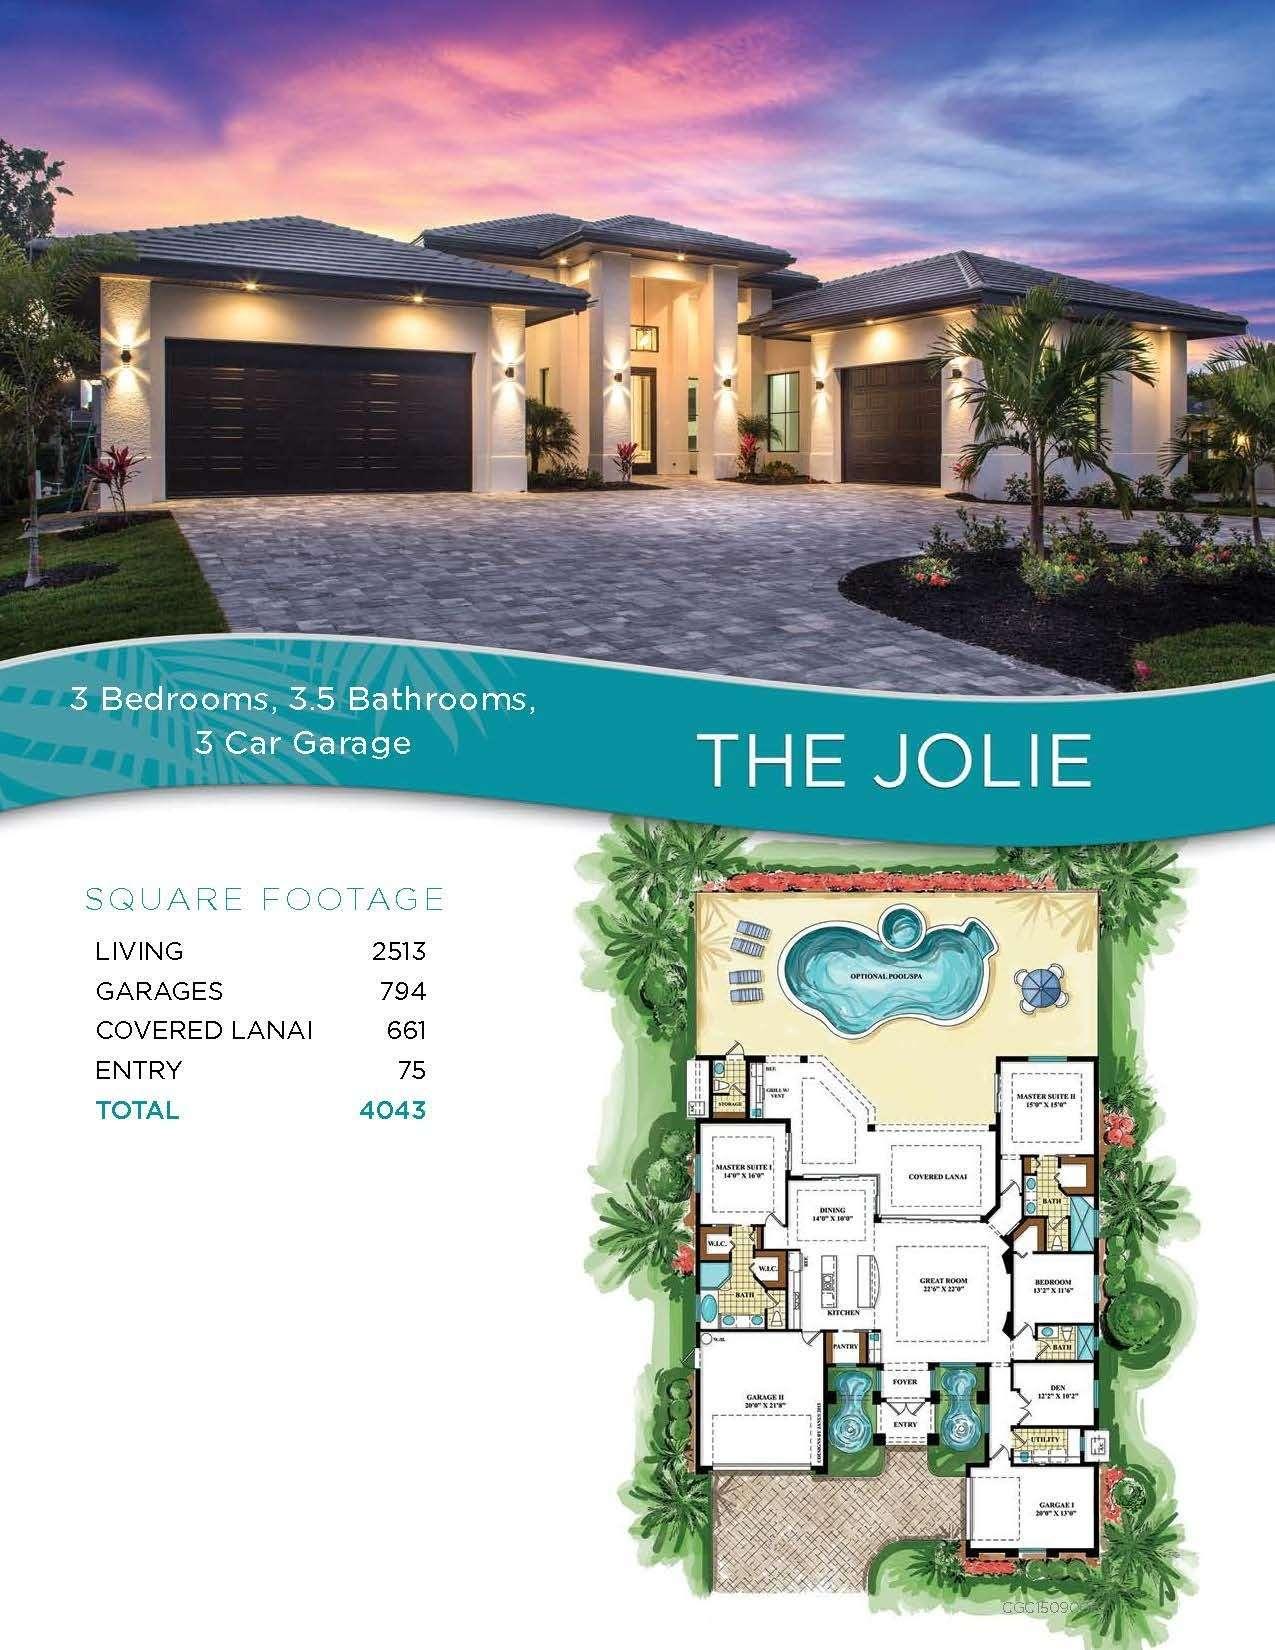 Floorplan: The Jolie